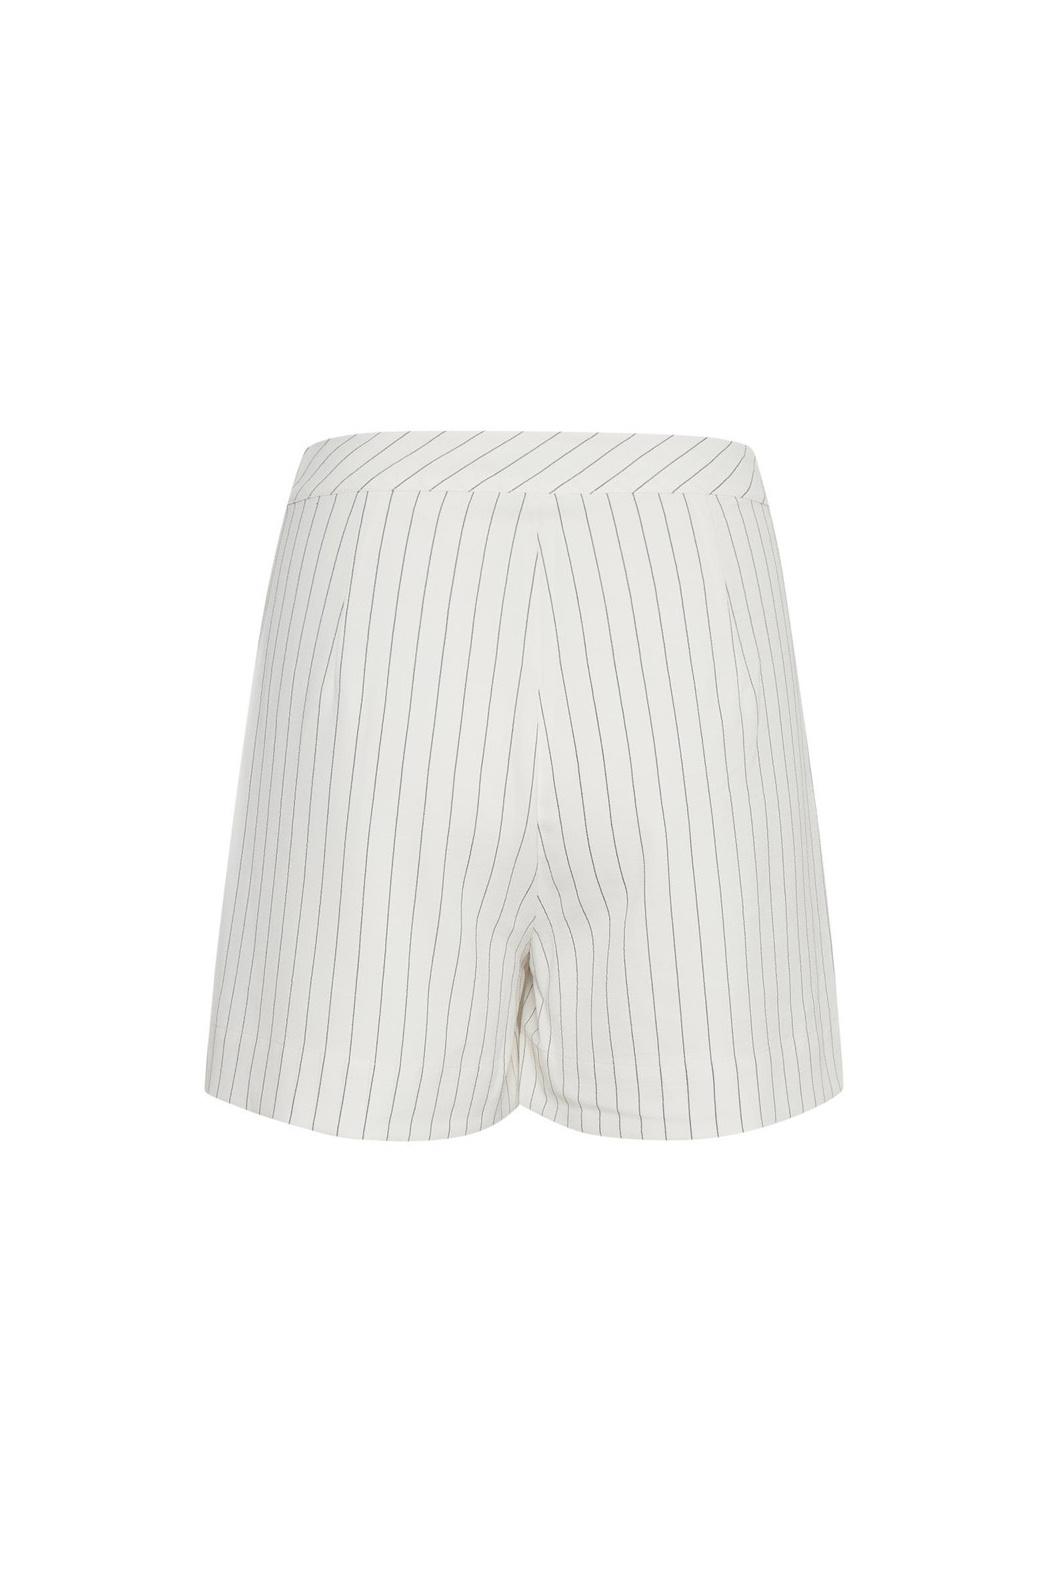 Gestuz Aga Shorts - Stripe